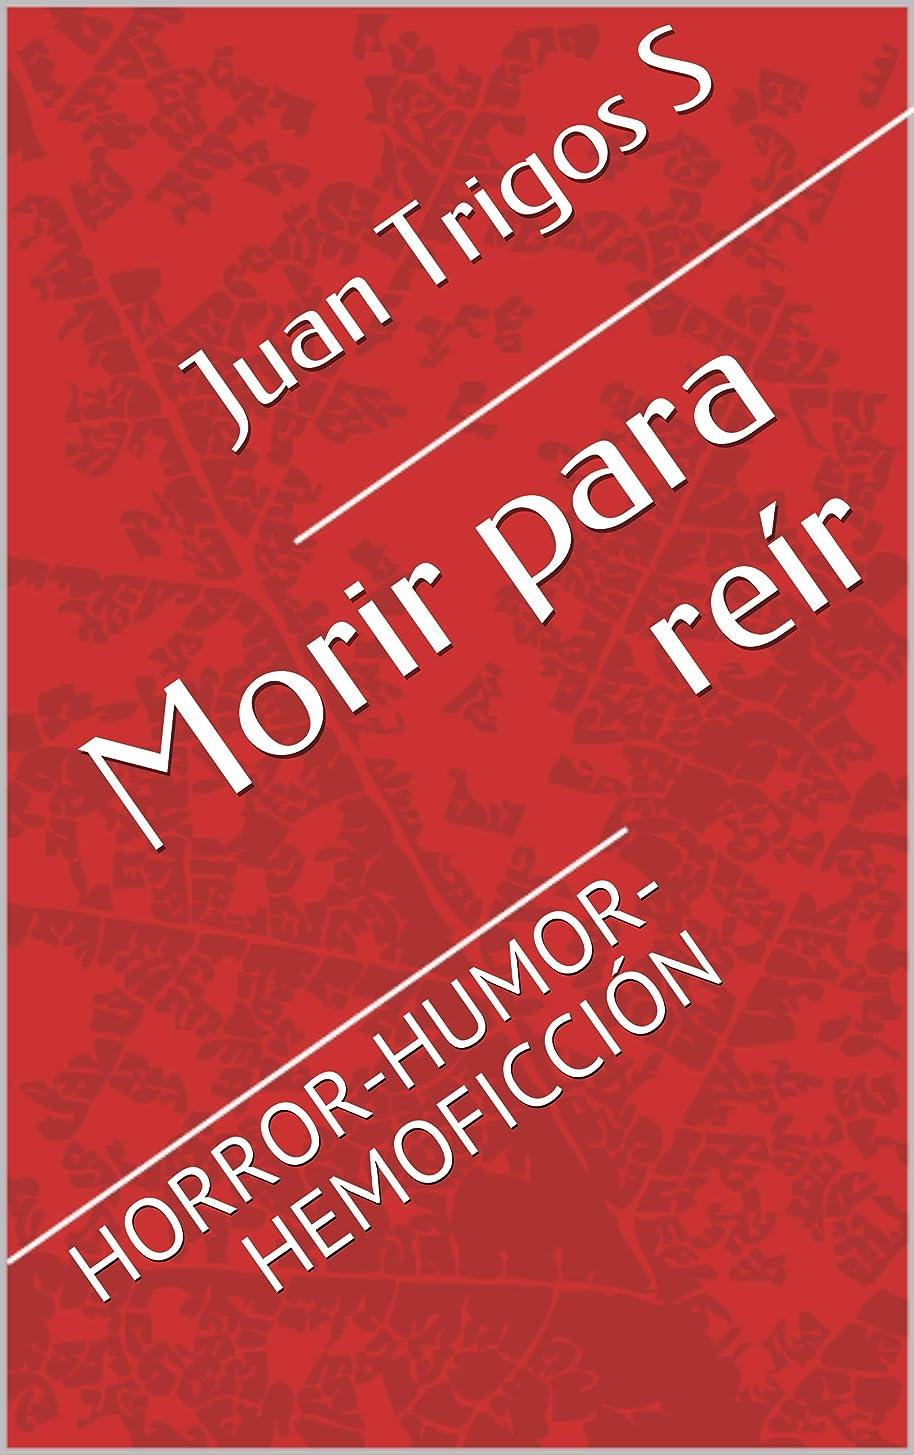 Morir para reír  : HORROR-HUMOR-HEMOFICCIóN (Spanish Edition)